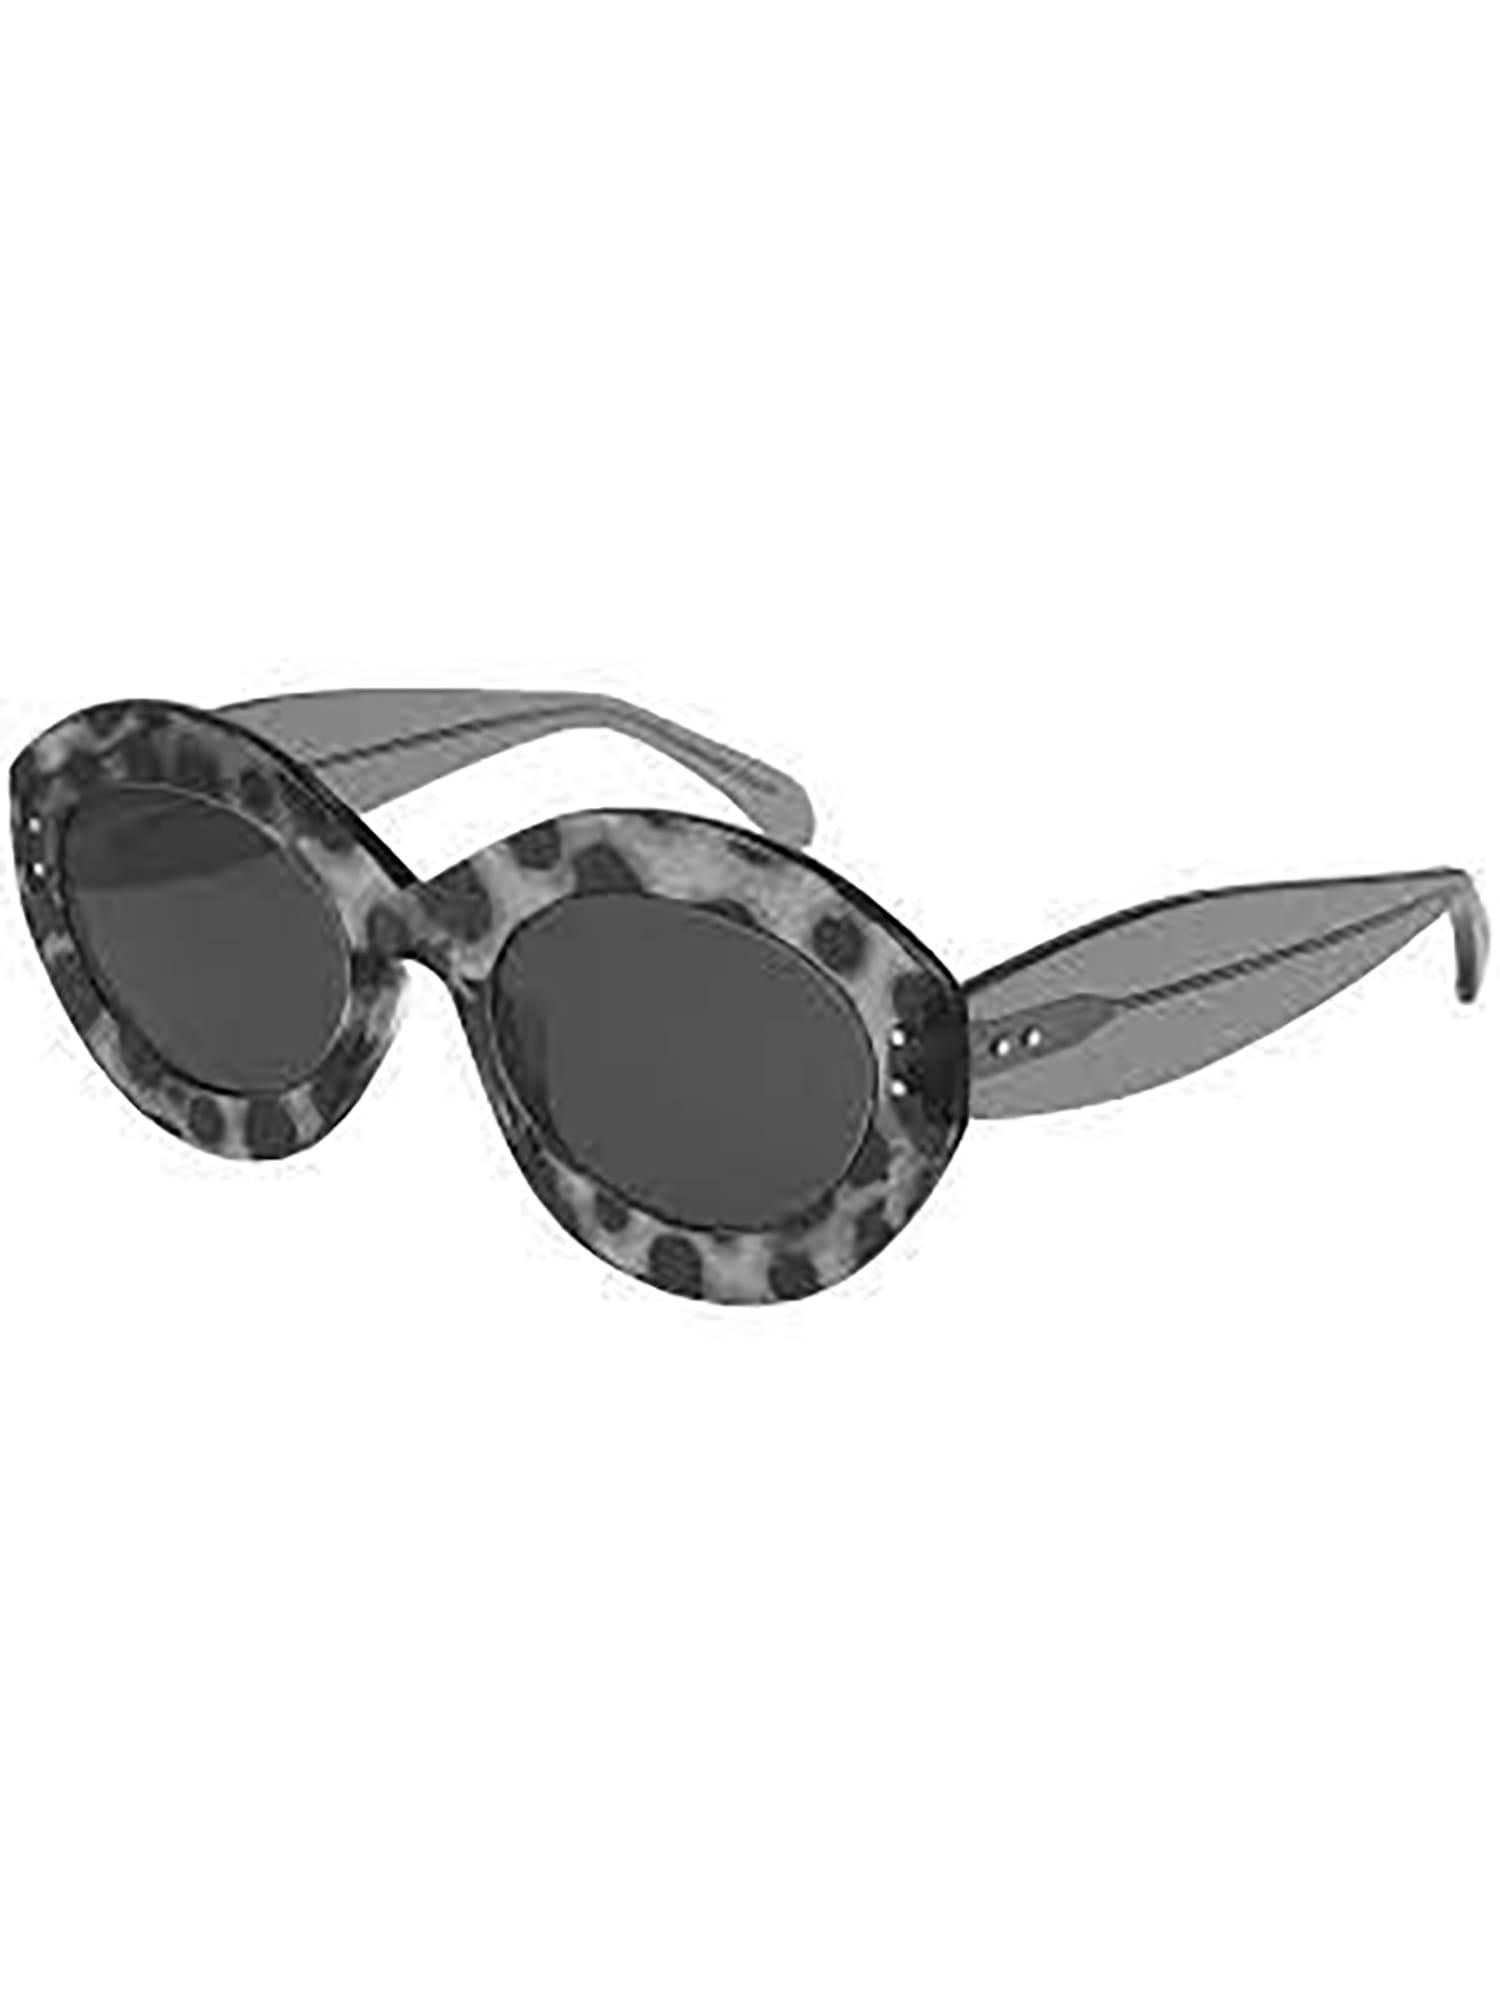 Alaïa Aa0004s Sunglasses In Grey Grey Grey